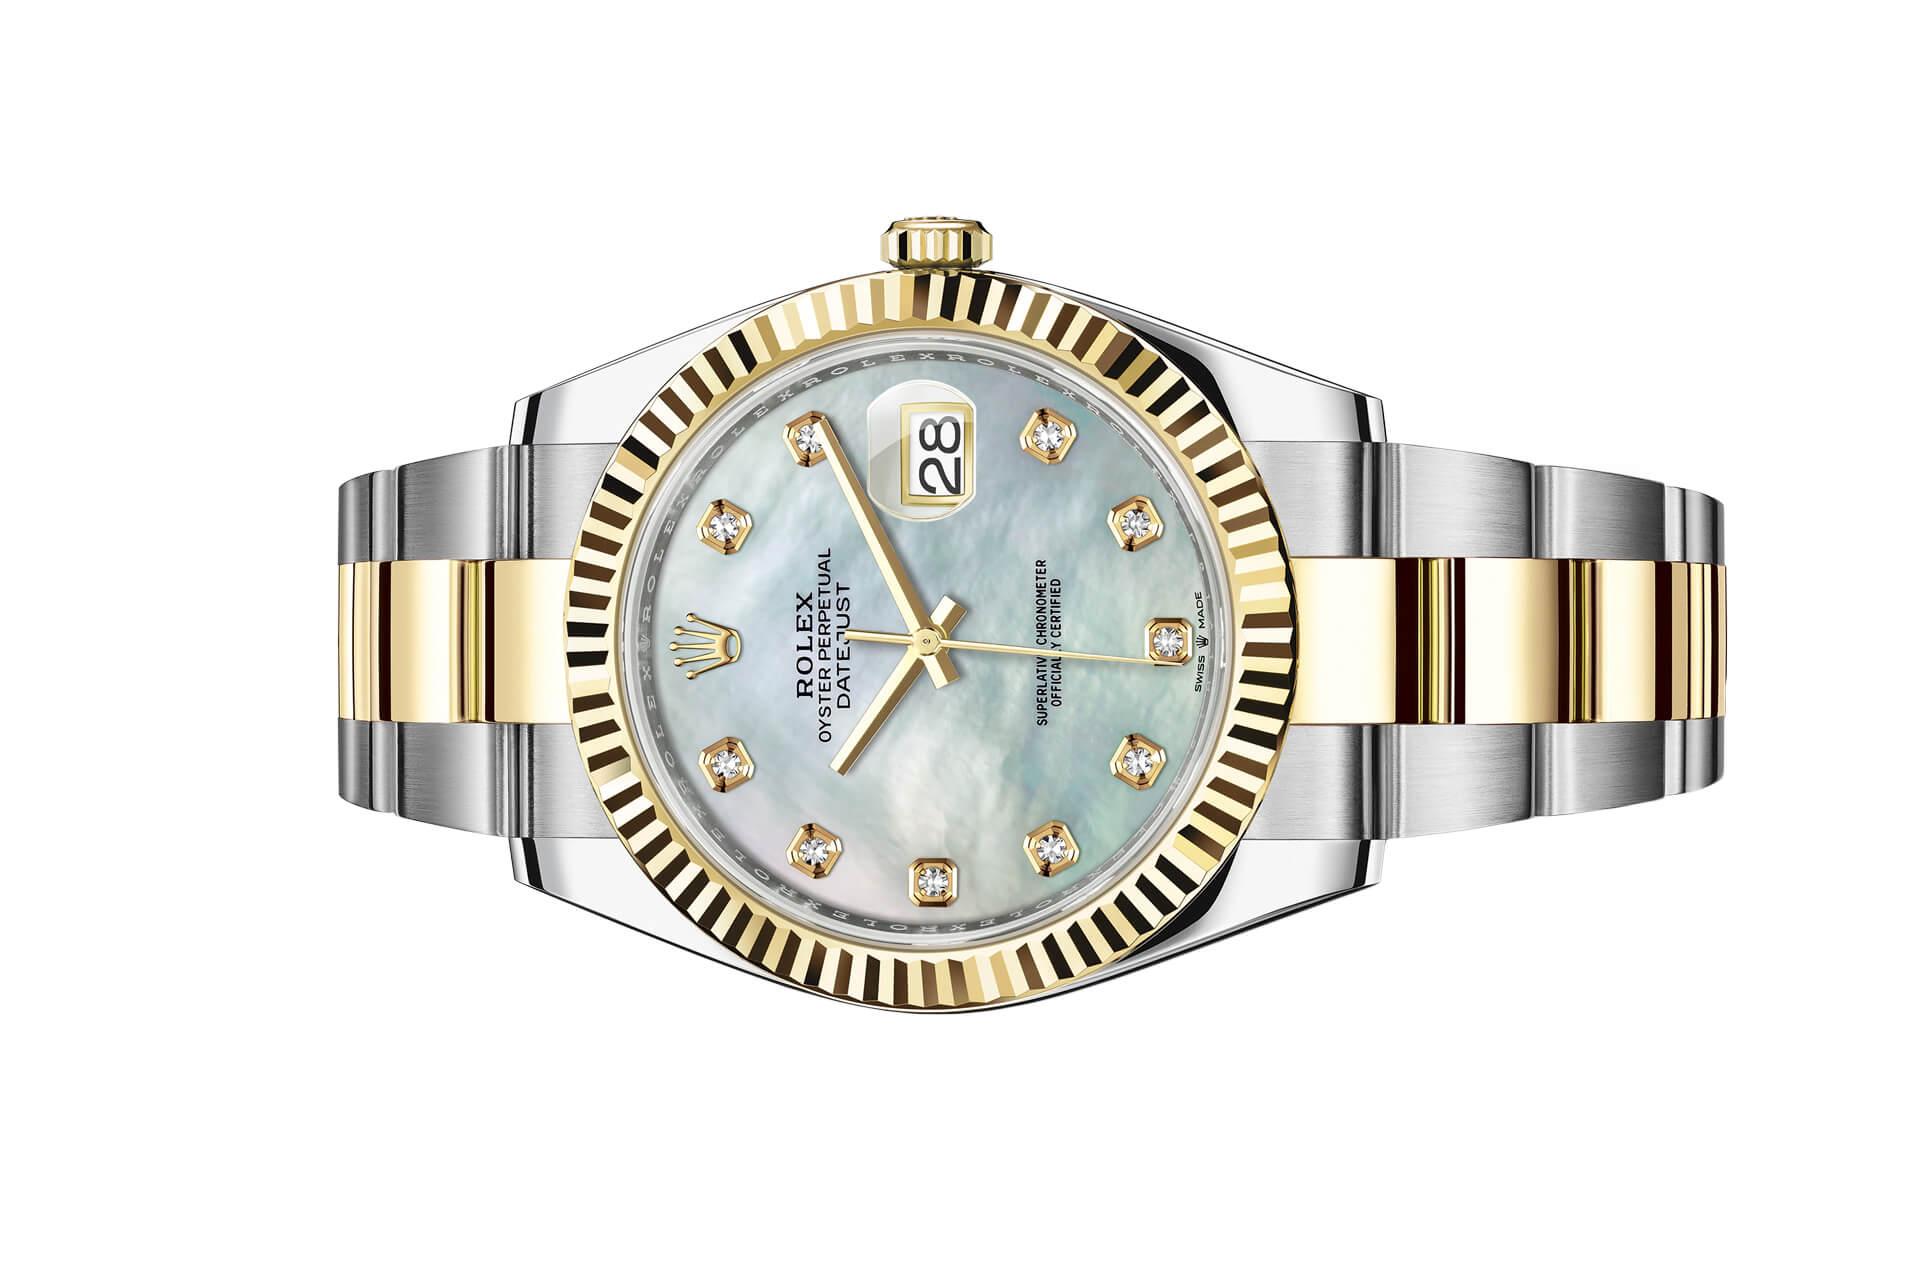 Đồng hồ Rolex Datejust 41 Mặt Số Vỏ Trai Trắng